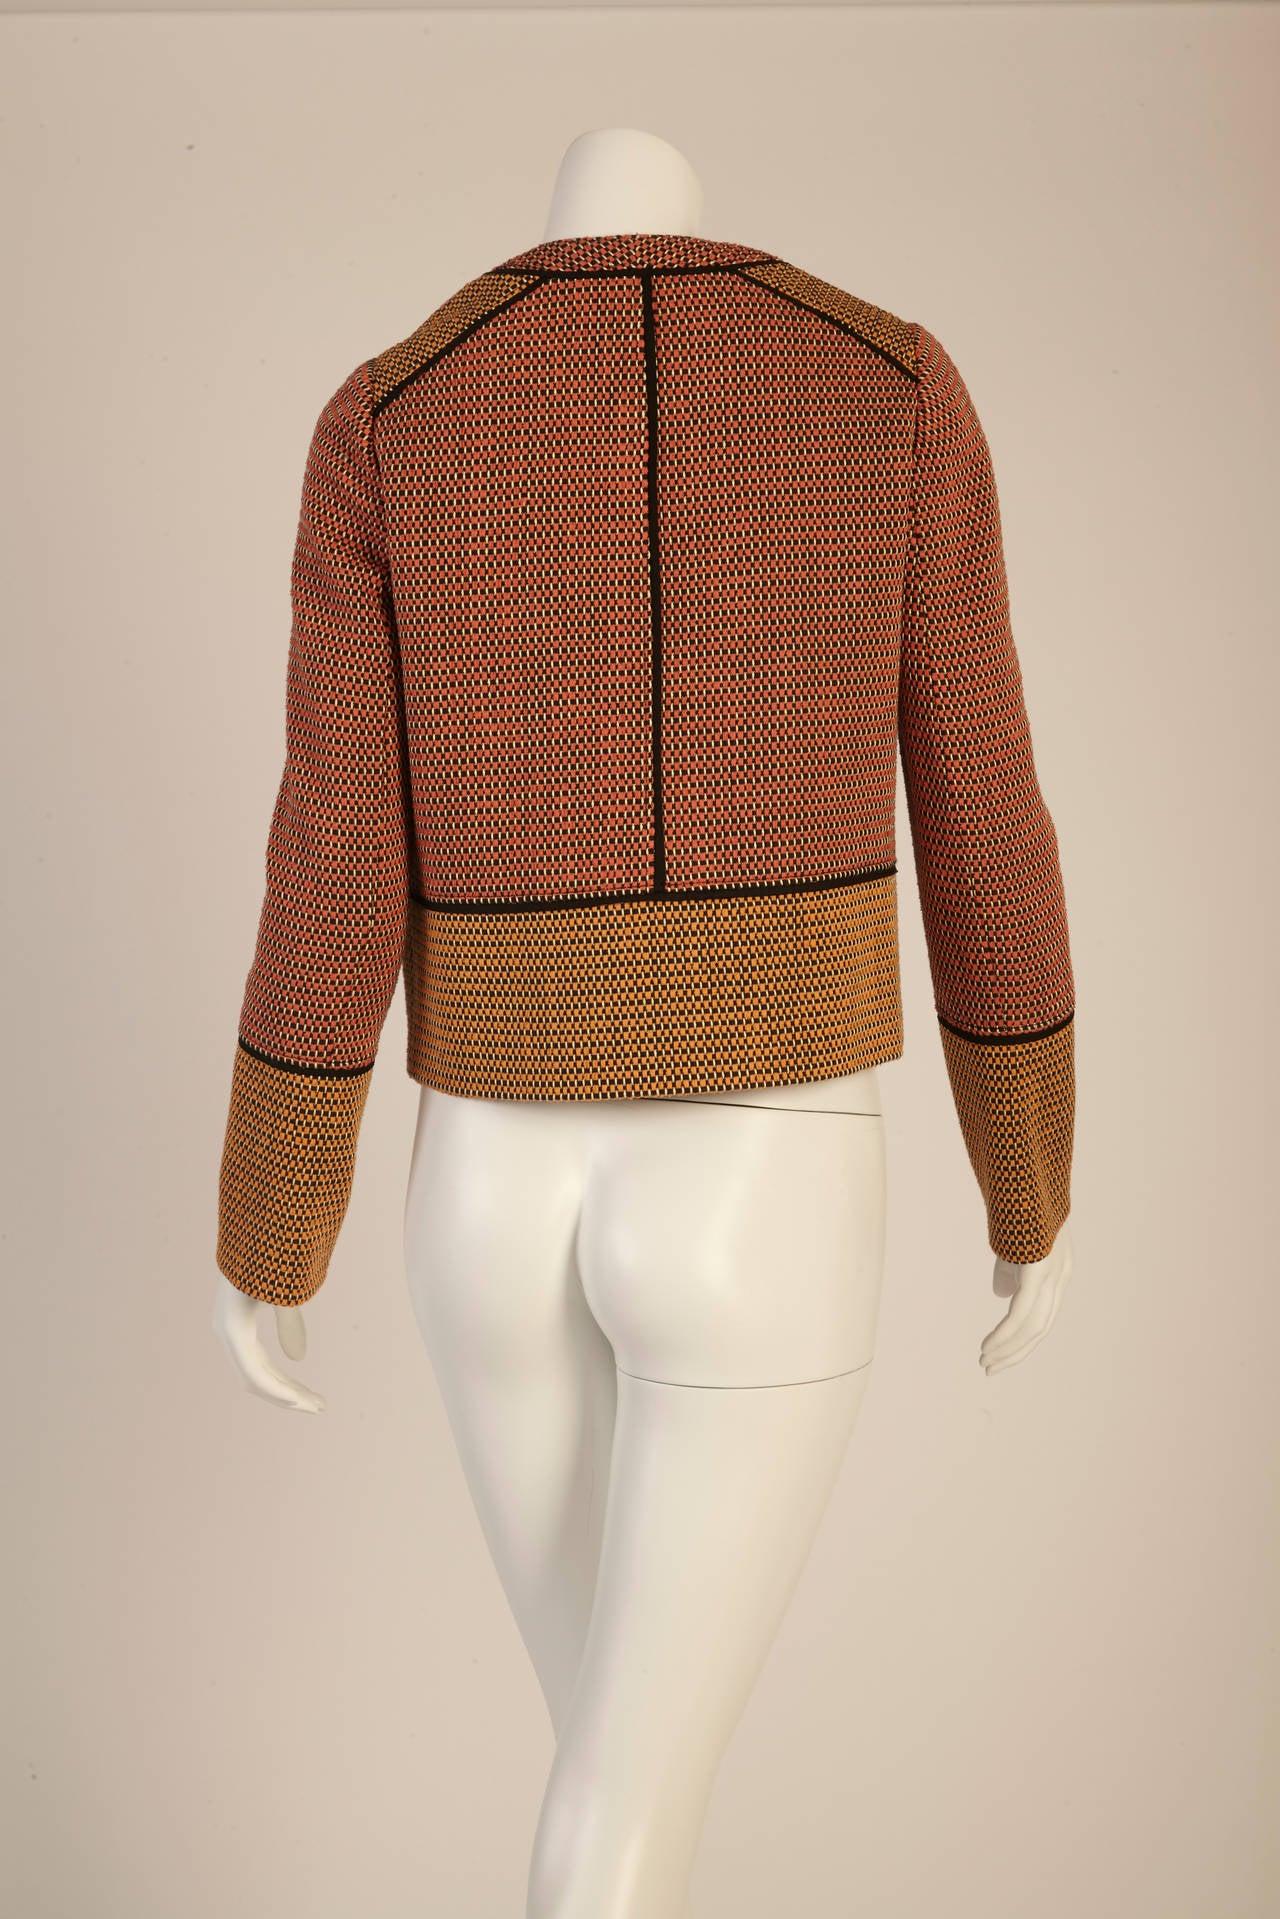 Proenza Schouler Multi-Color Jacket 3